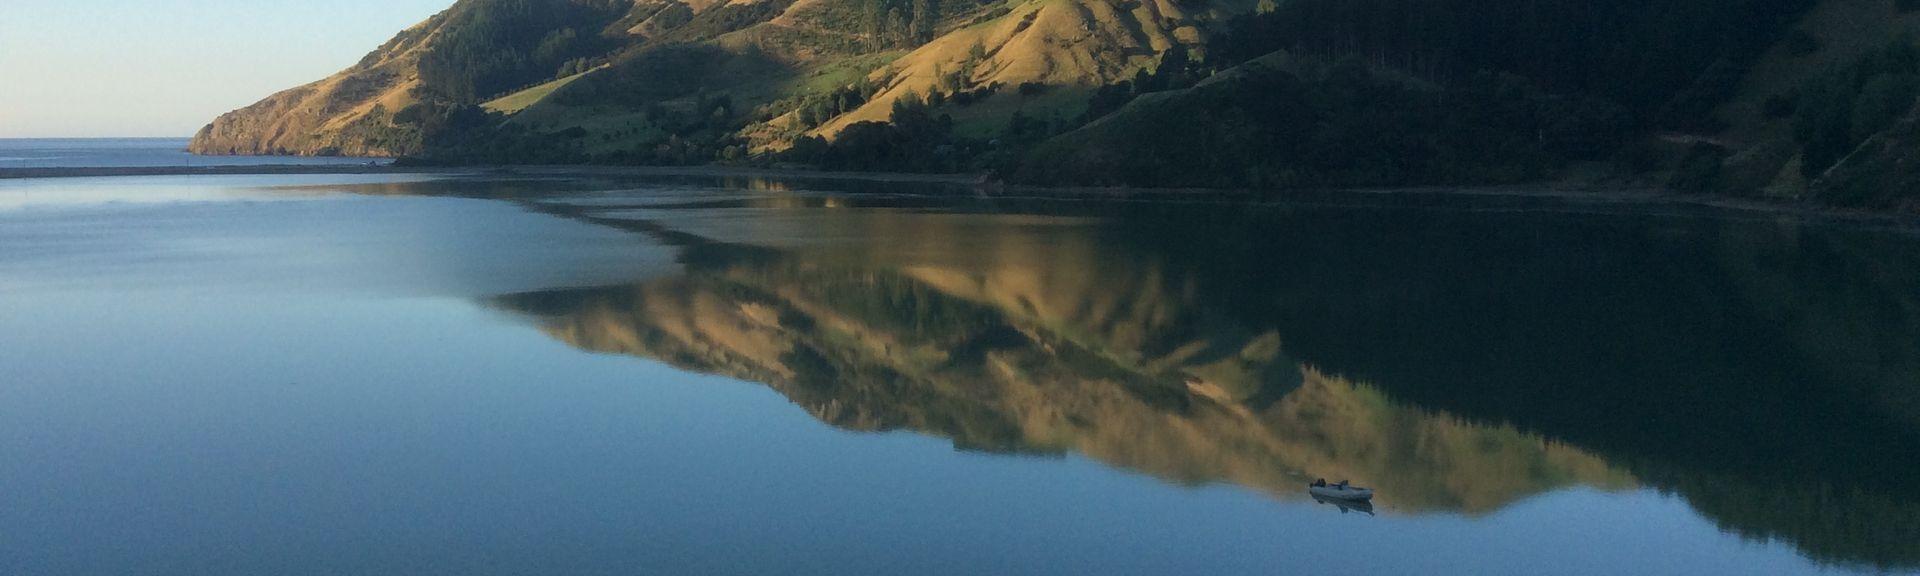 Okiwi Bay, Marlborough, Nouvelle-Zélande